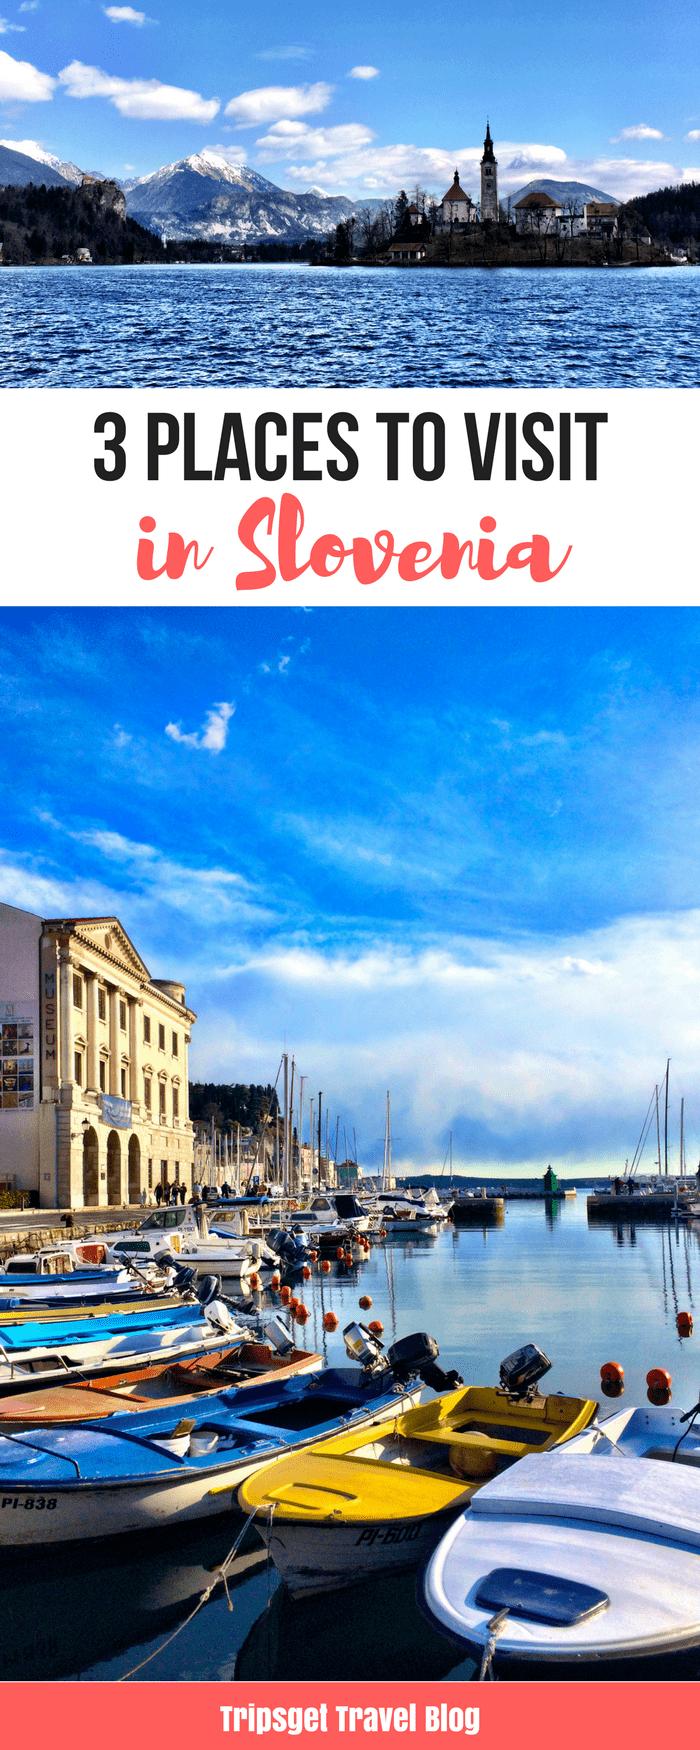 3 places to visit in Slovenia: Lake Bled, Piran, Portoroz and Ljubljana